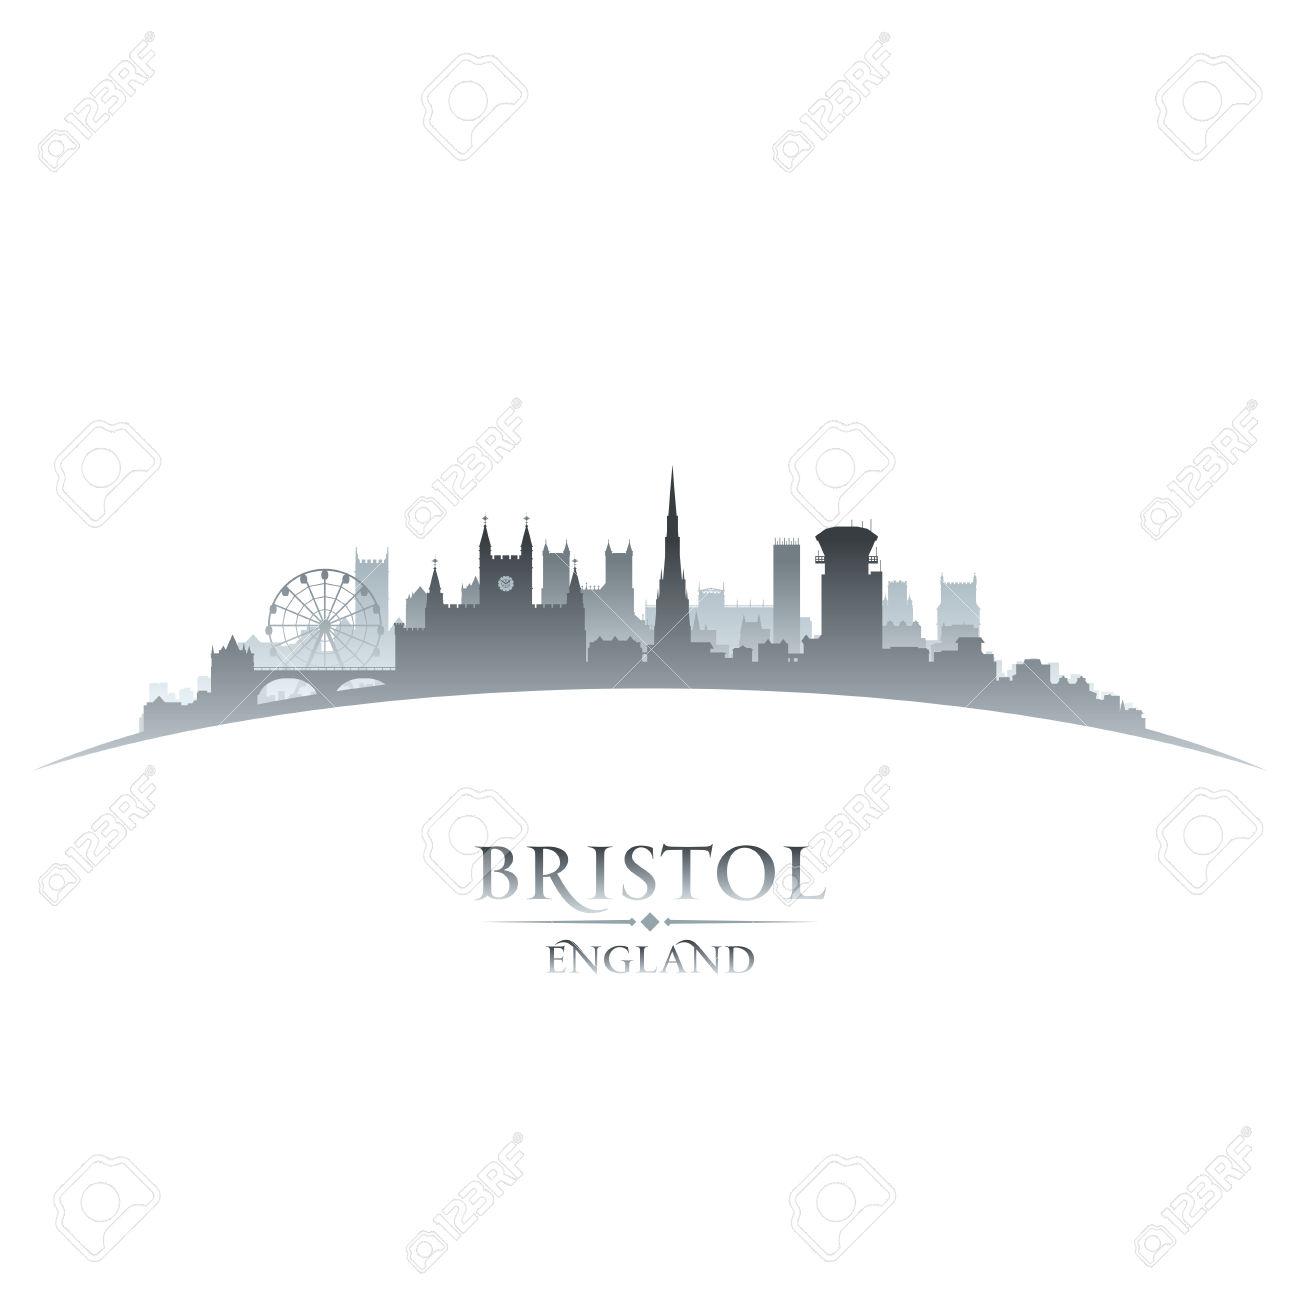 Bristol clipart.